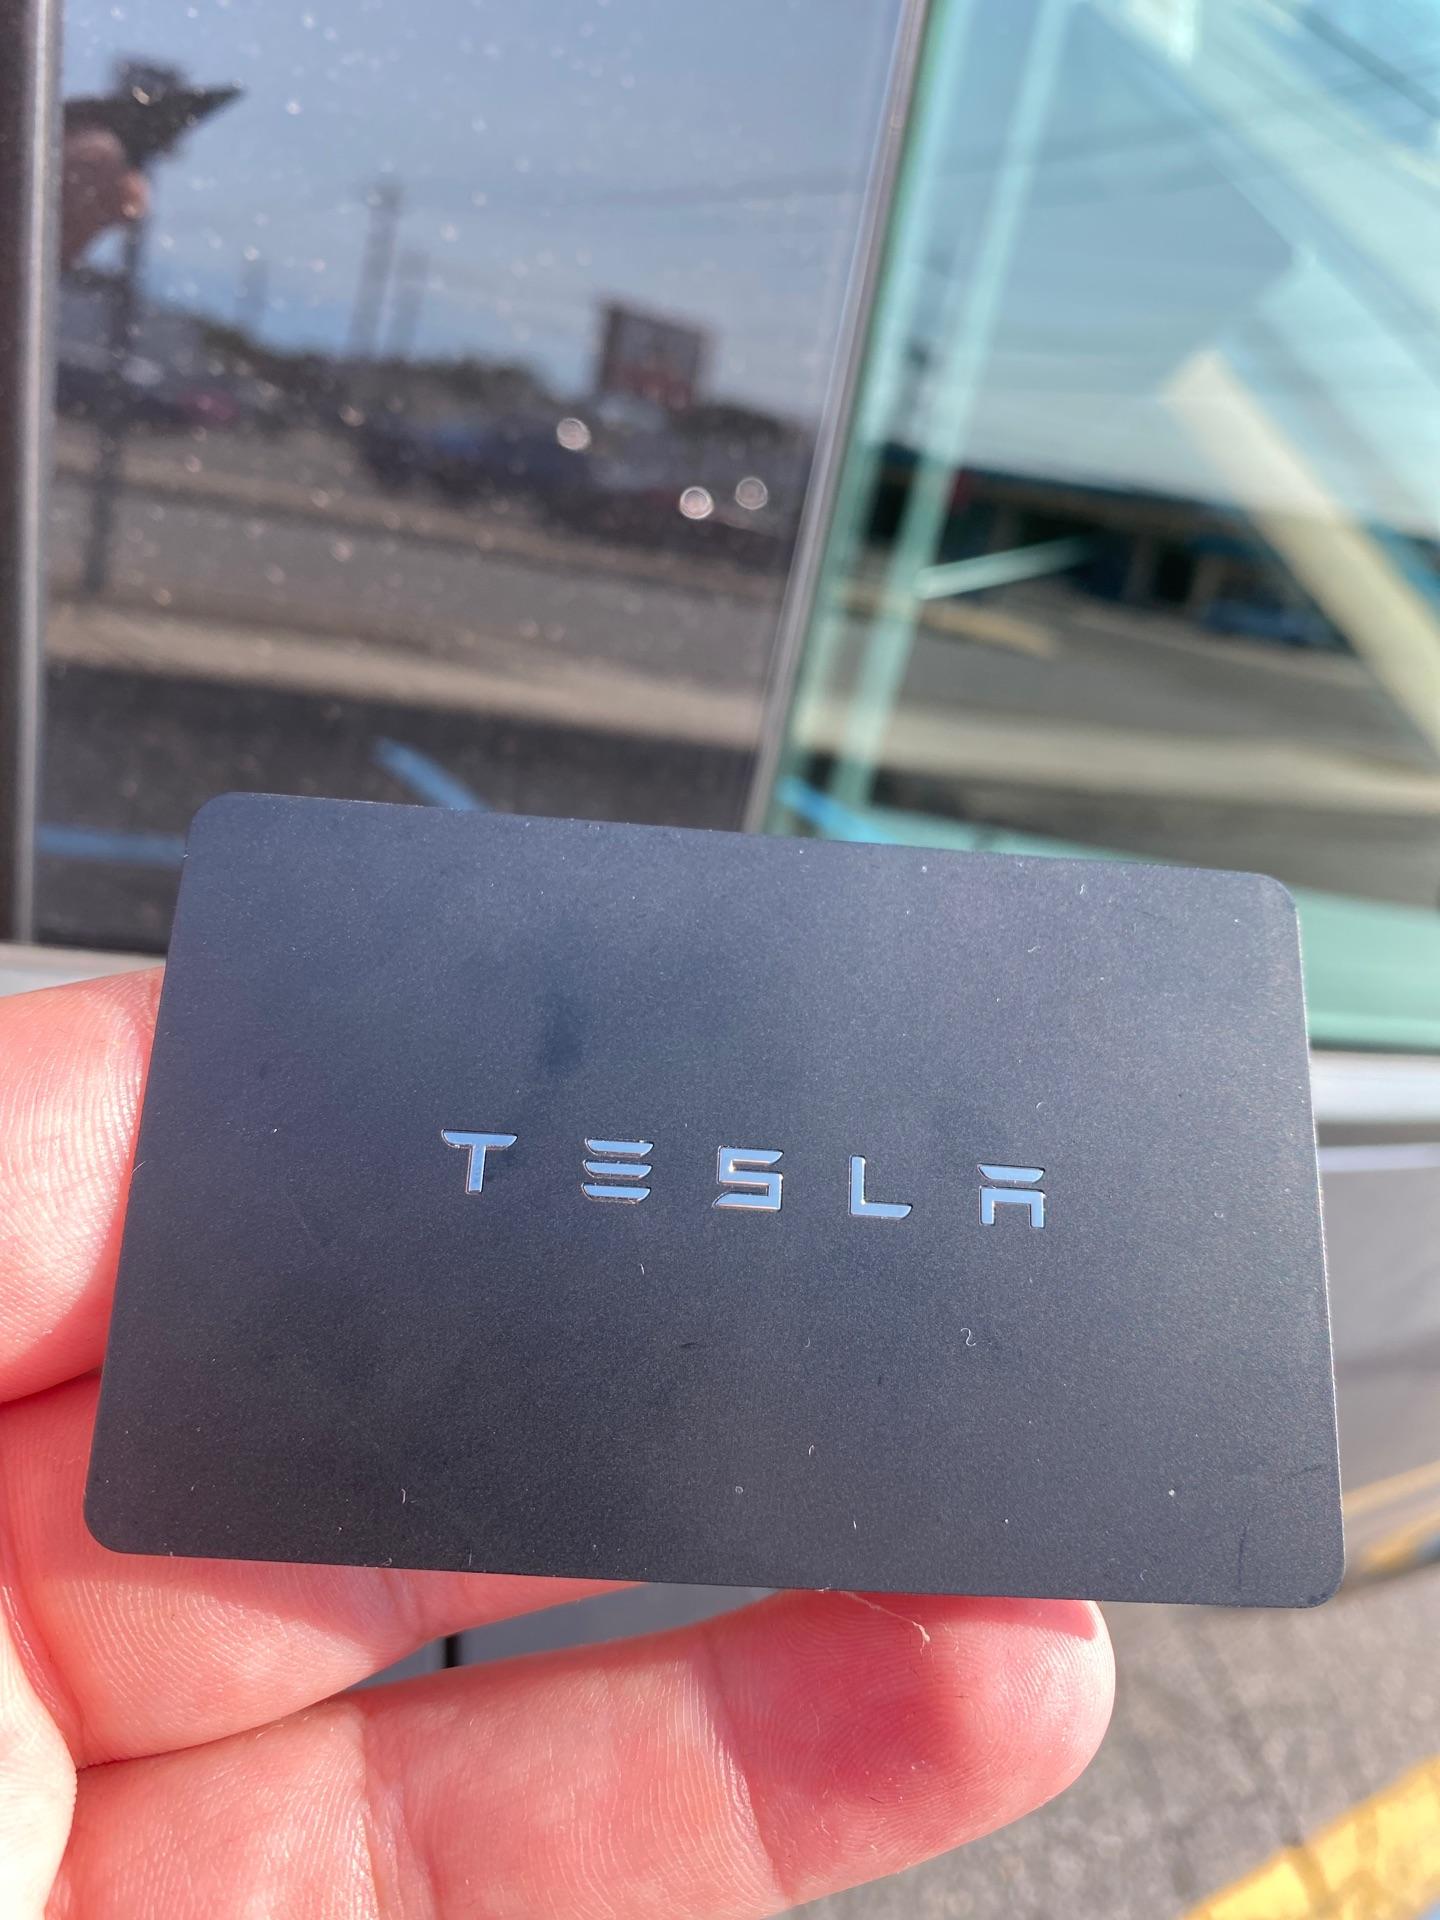 2020 Tesla Model Y - photo 3